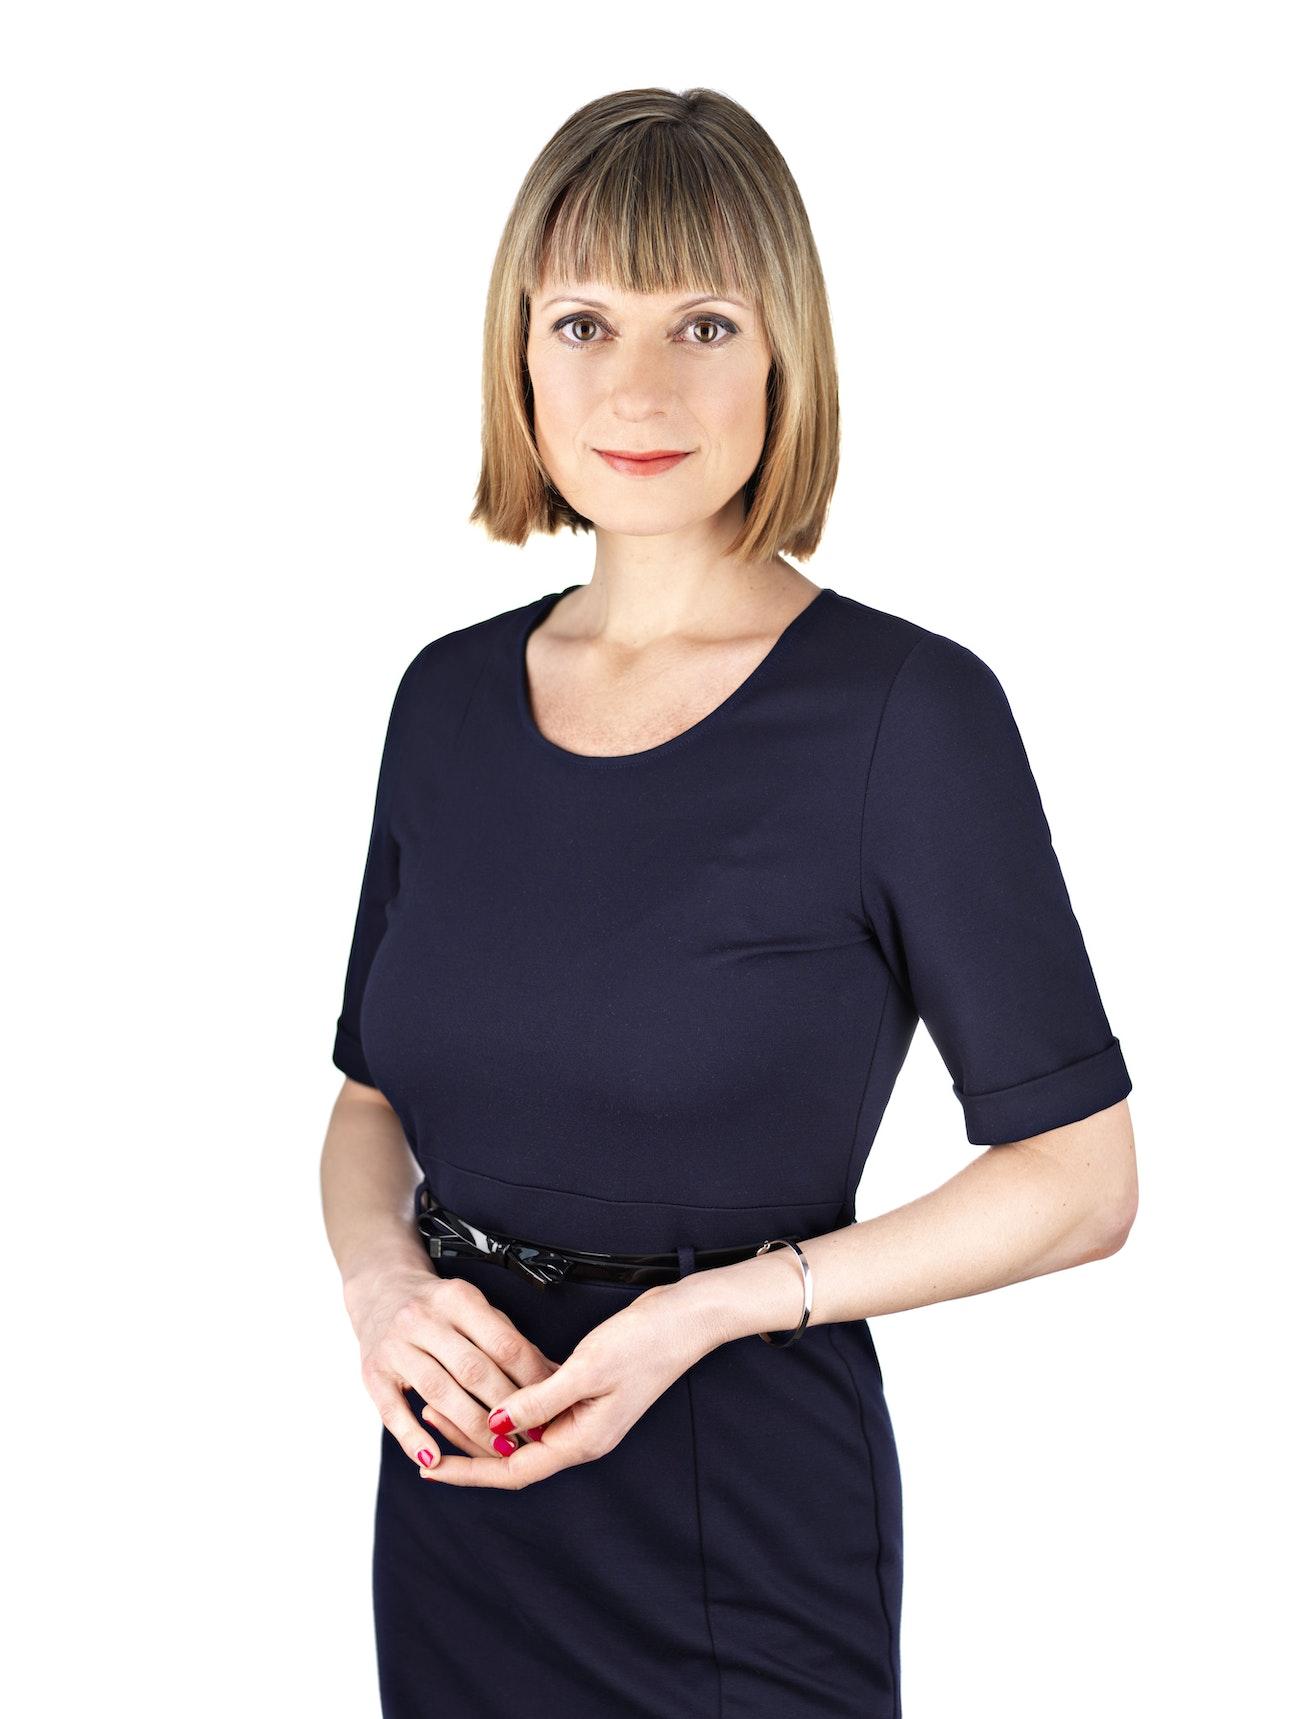 (c) Lisa-Maria Trauer